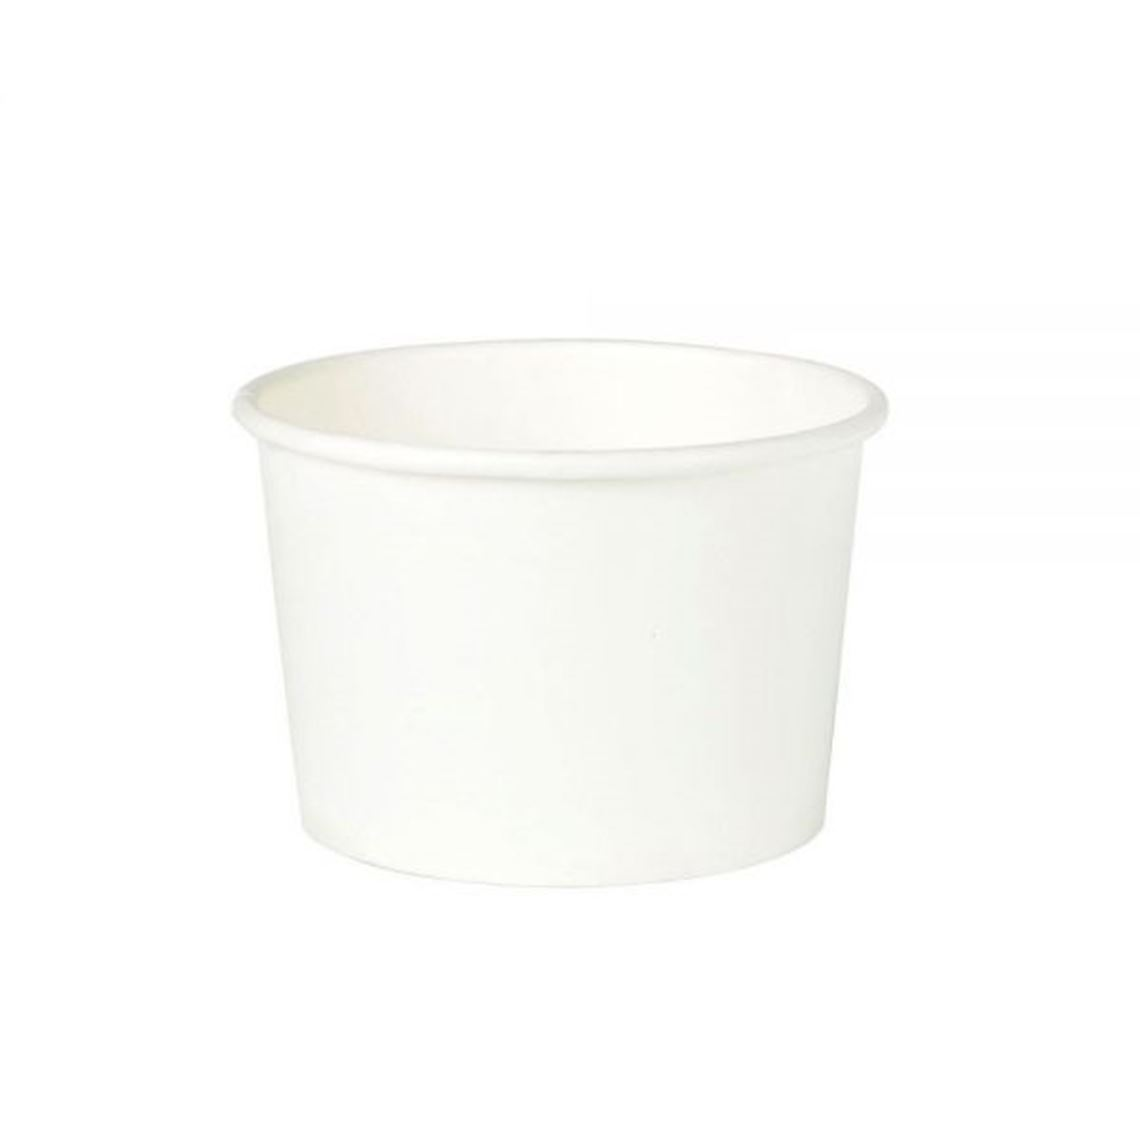 Karton-Universal-Becher 200 ml / 8 oz, Ø 90 mm, weiß